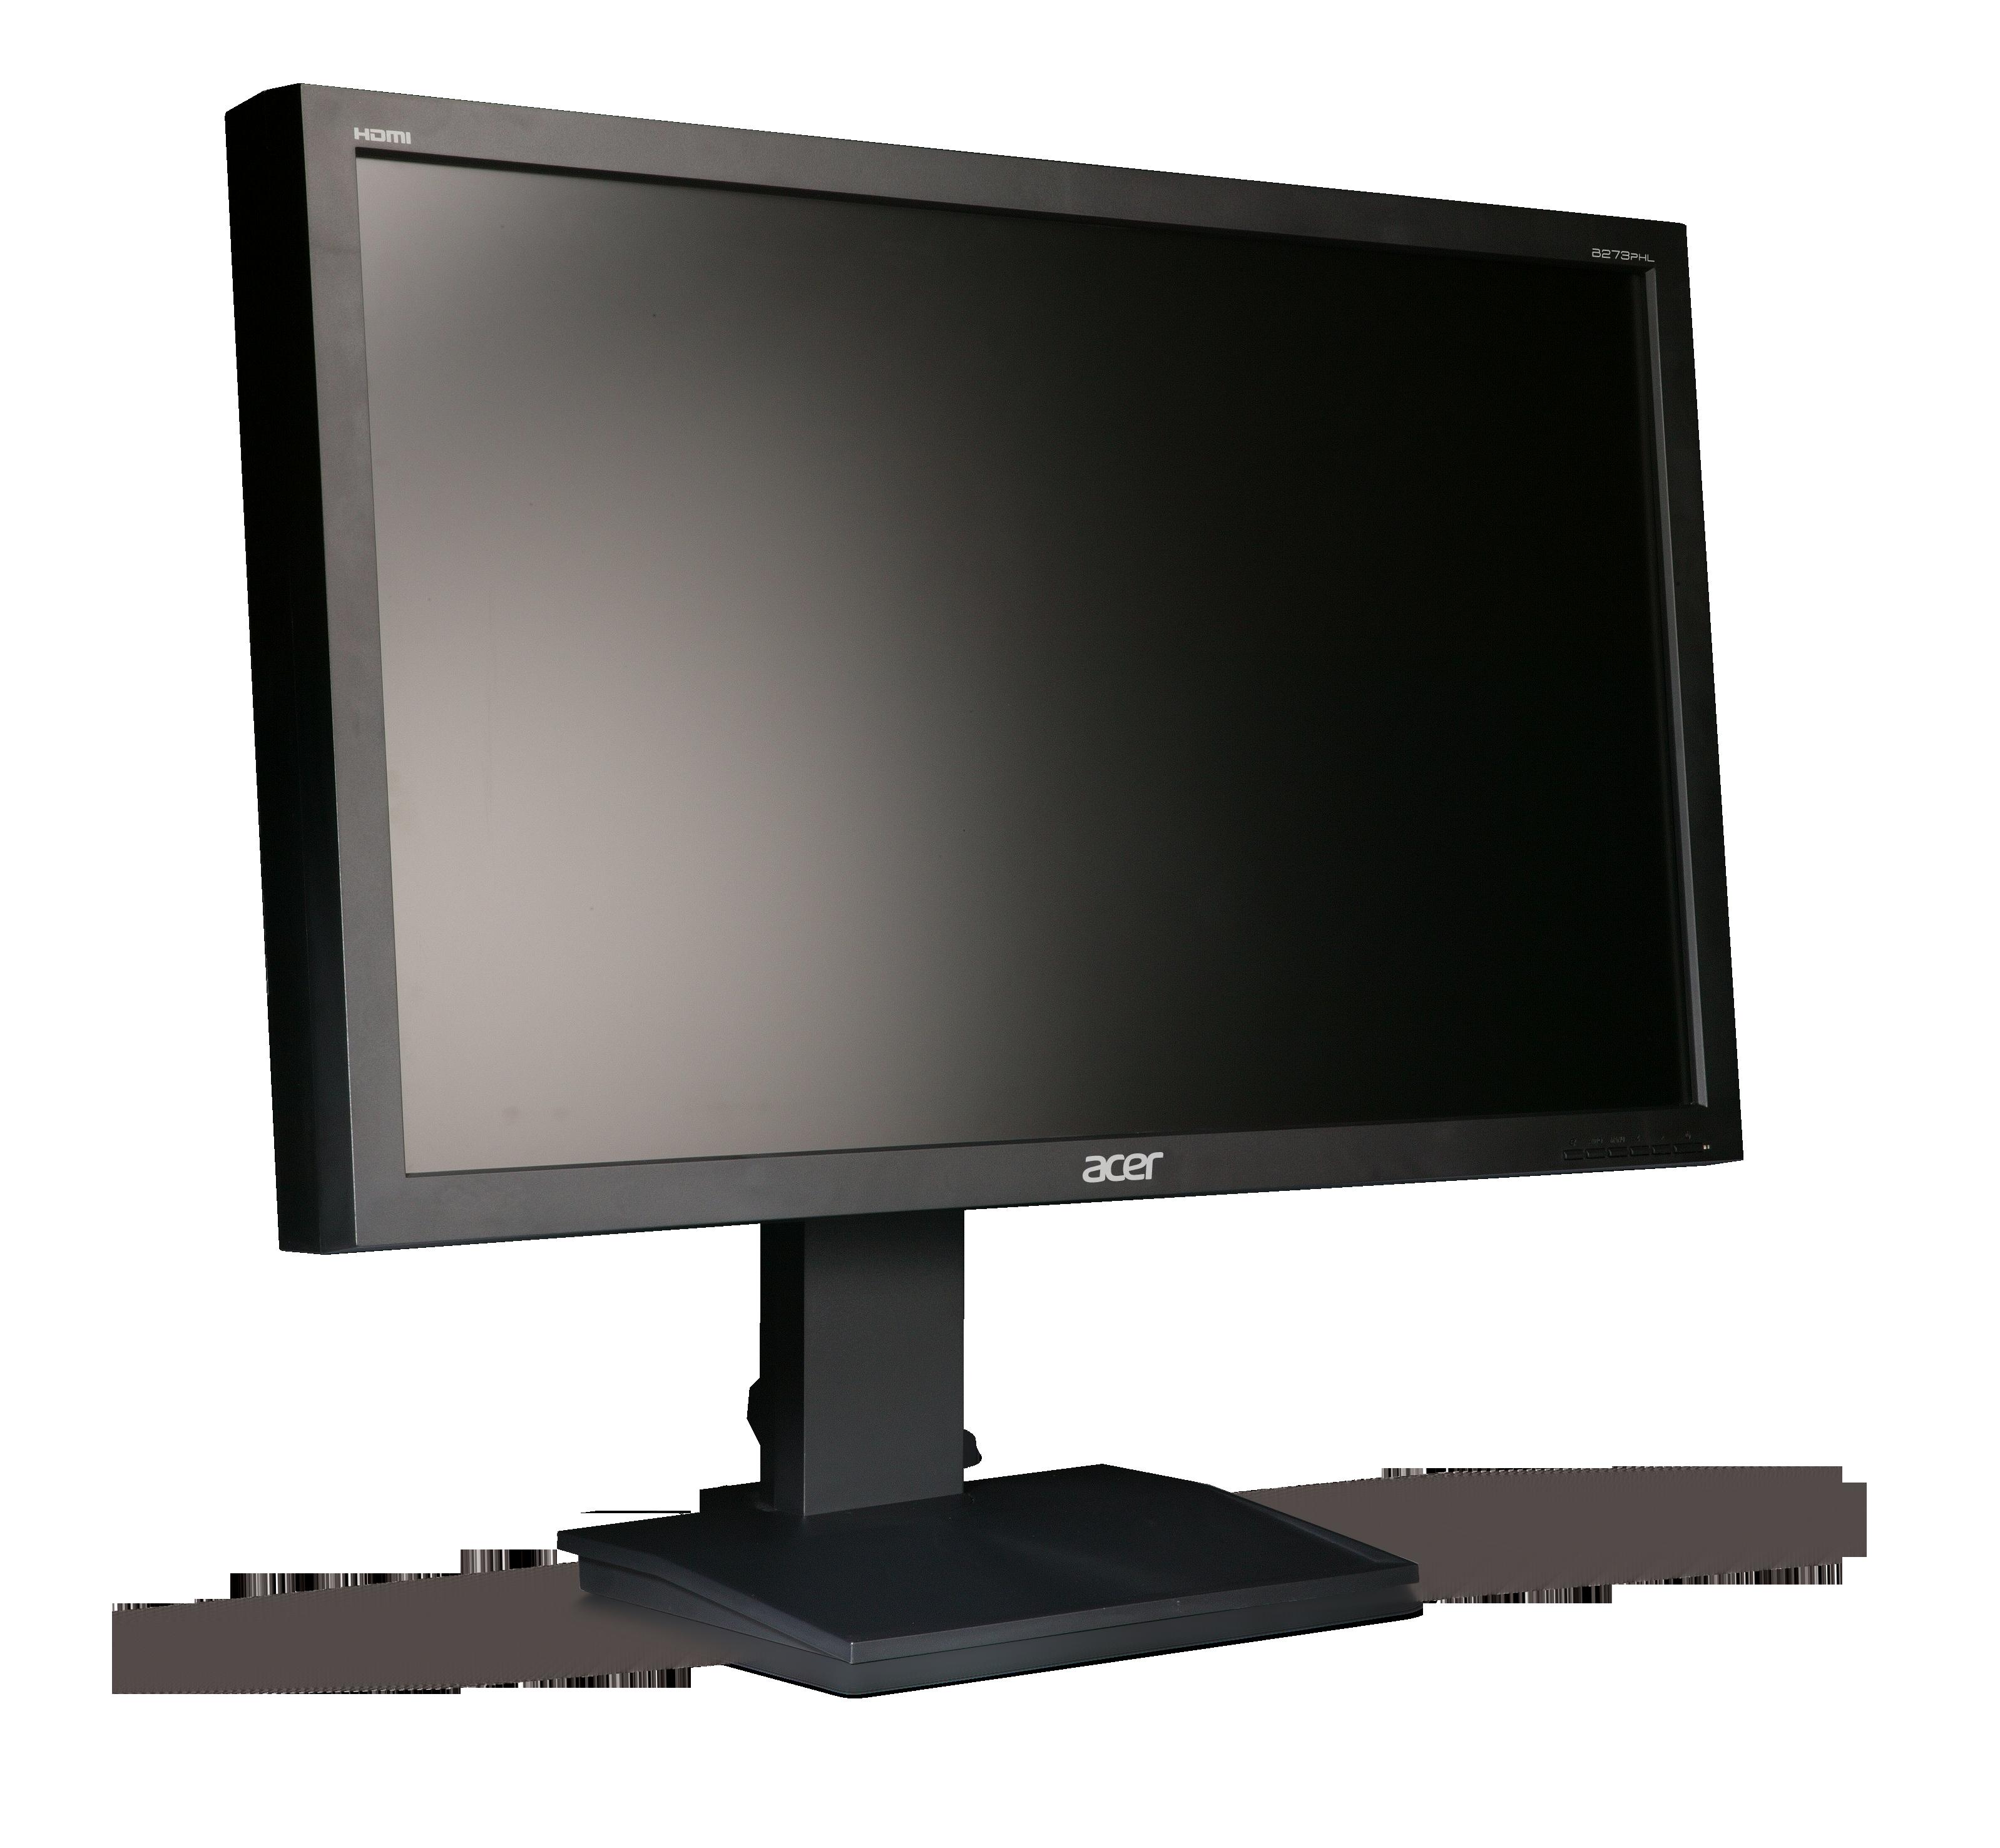 Monitor Png Image - Monitor, Transparent background PNG HD thumbnail